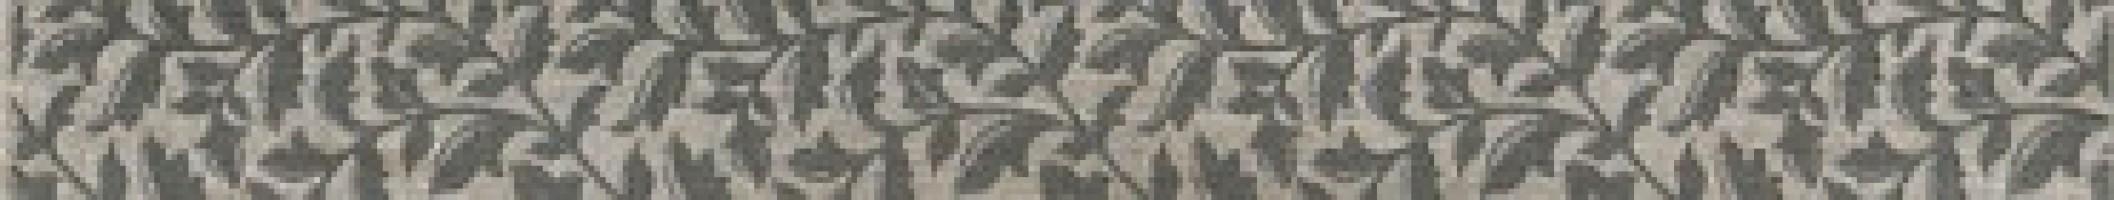 Бордюр Акация серый лапп. DT/B98/SG4130L 50.2x4.9 Kerama Marazzi